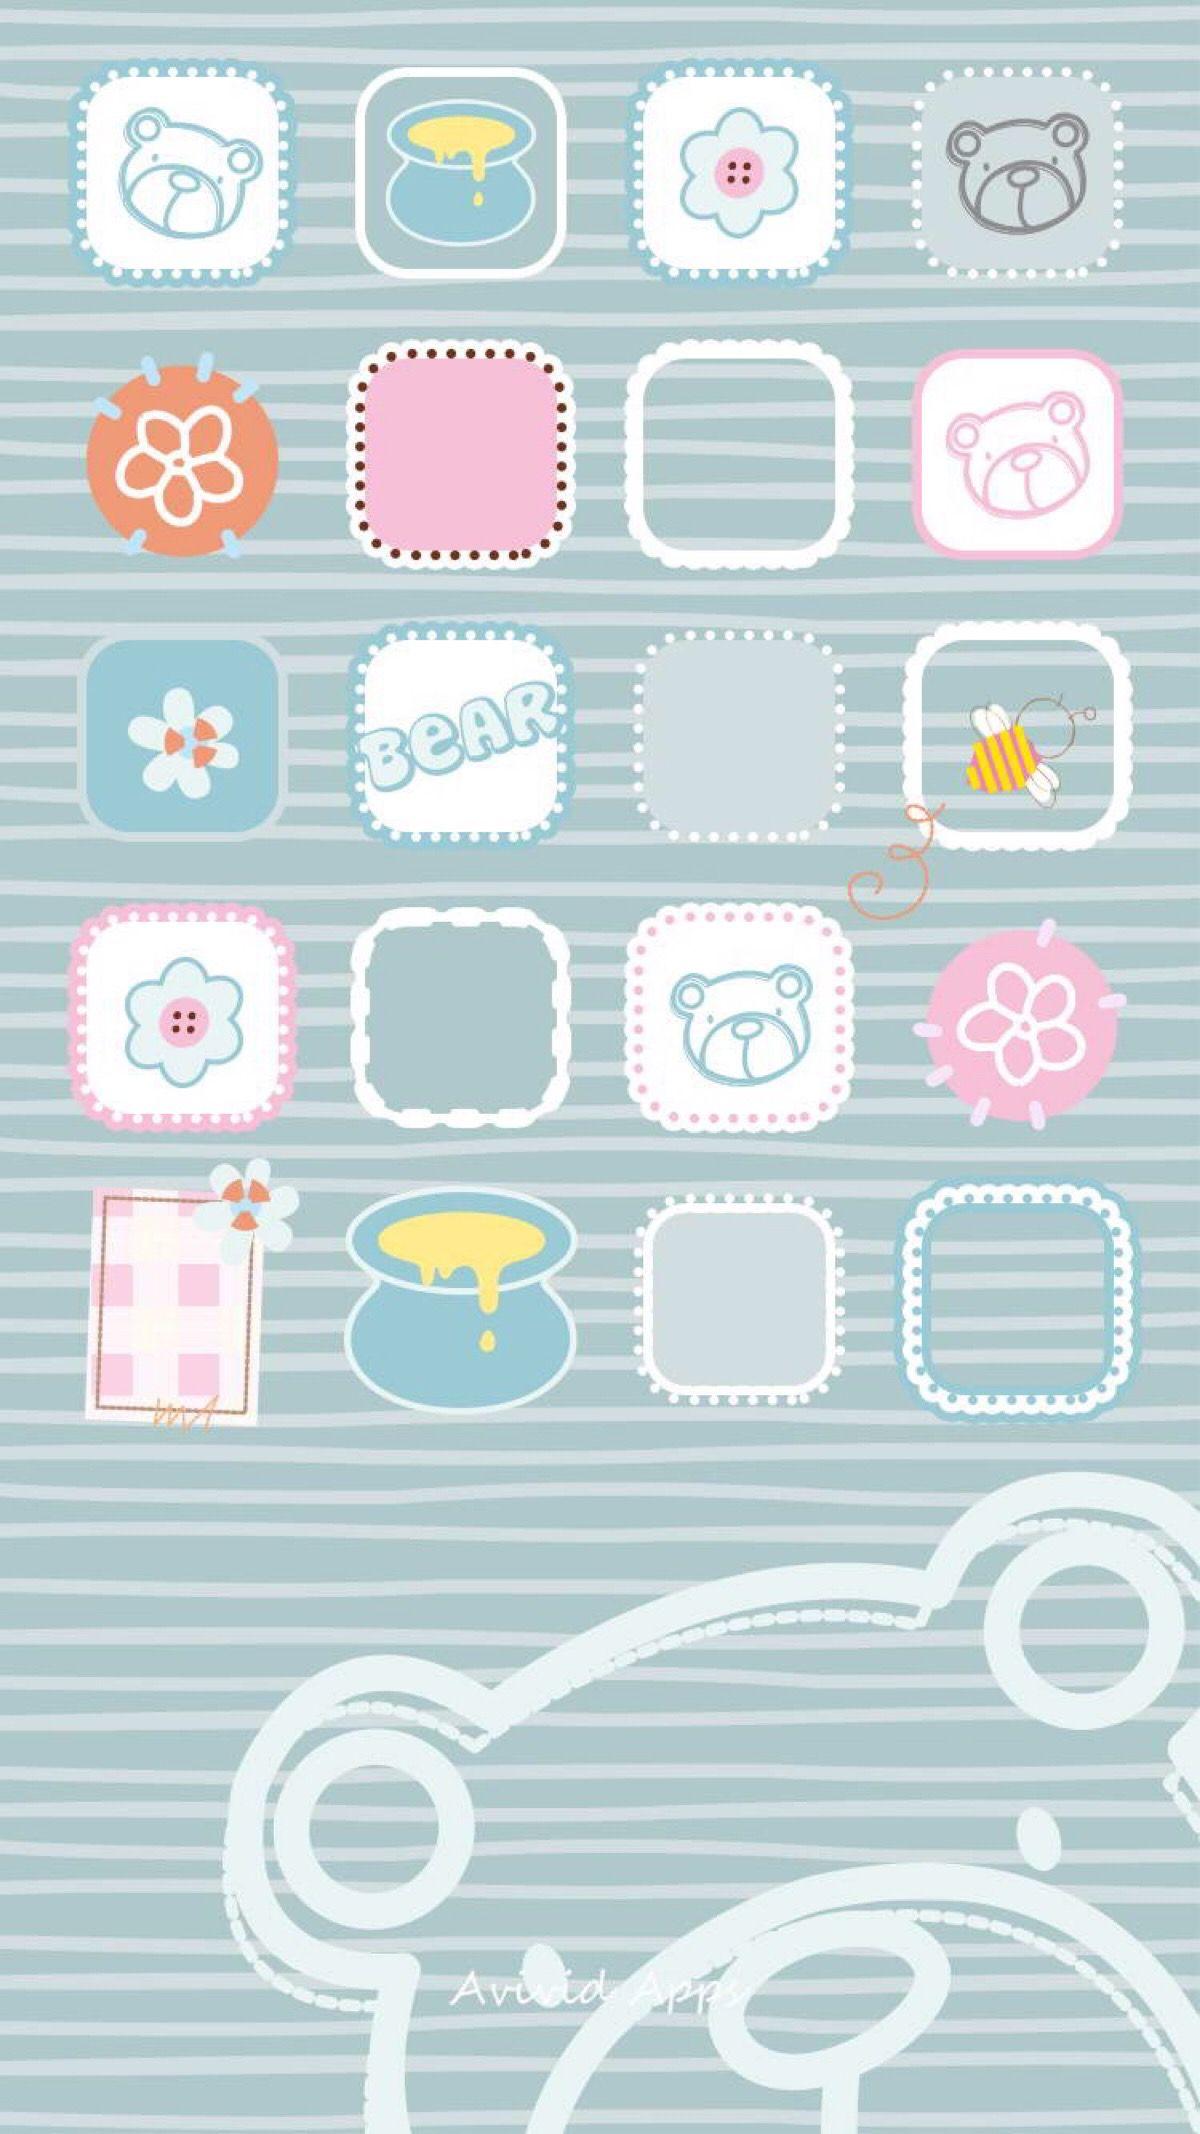 Iphone Homescreen Wallpaper Screen Savers Wallpapers Iphone Wallpaper